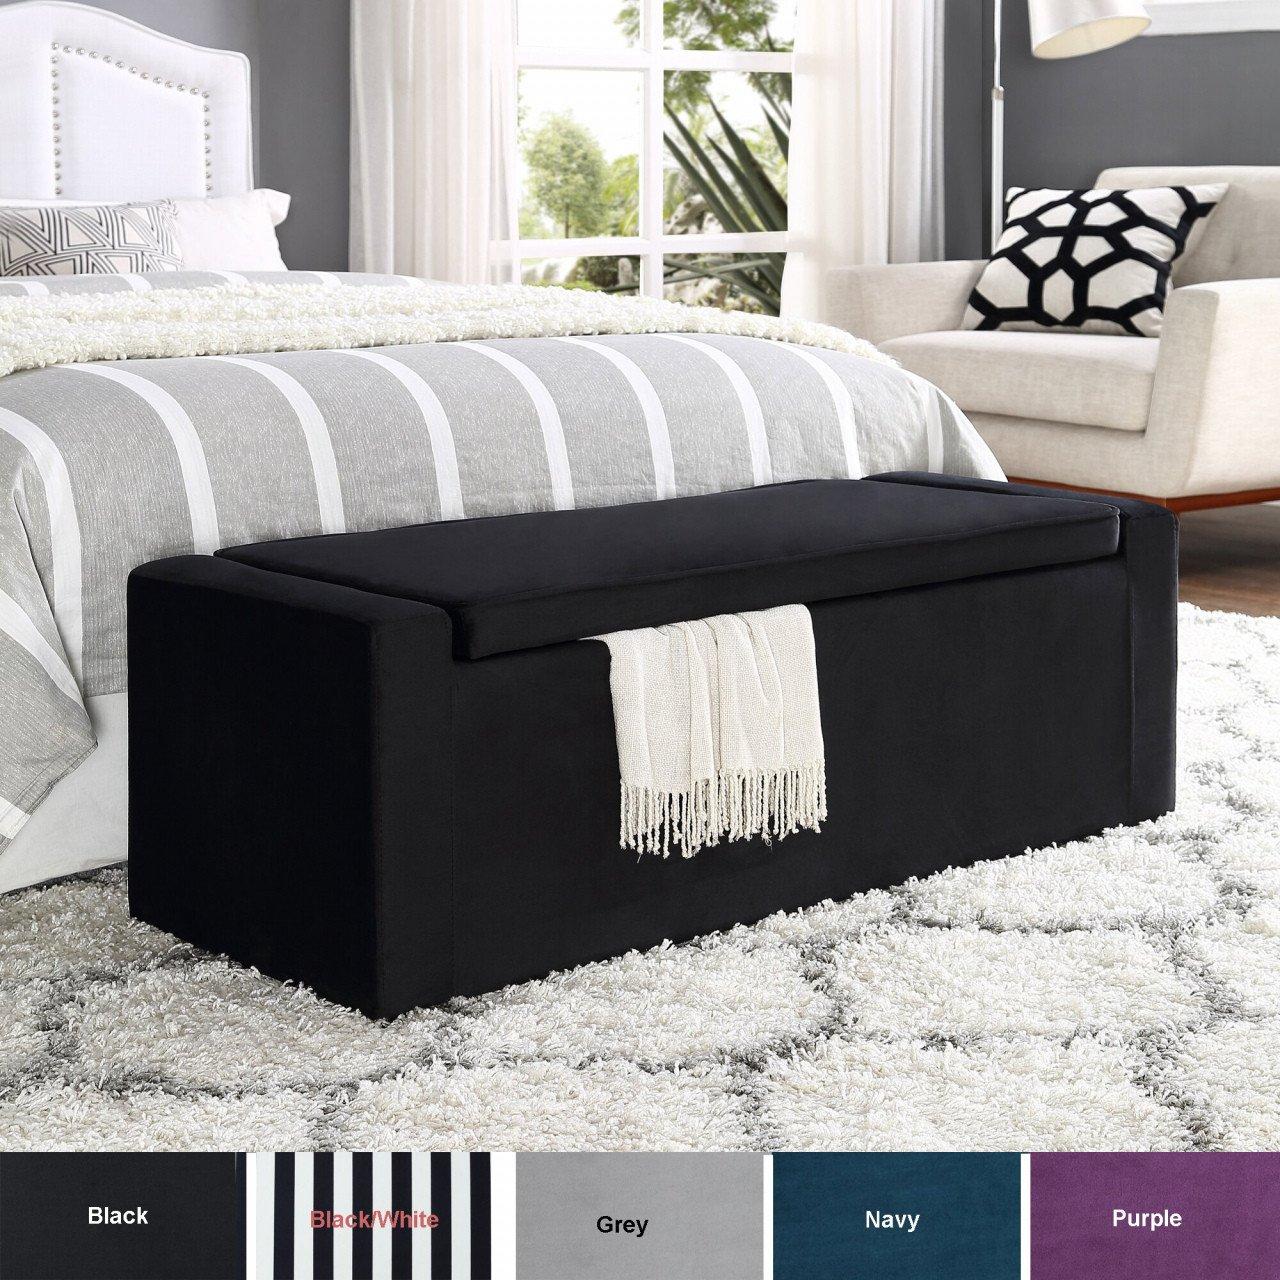 Small Storage Bench for Bedroom Elegant Small Entryway Storage Bench Amazon Vasagle Industrial